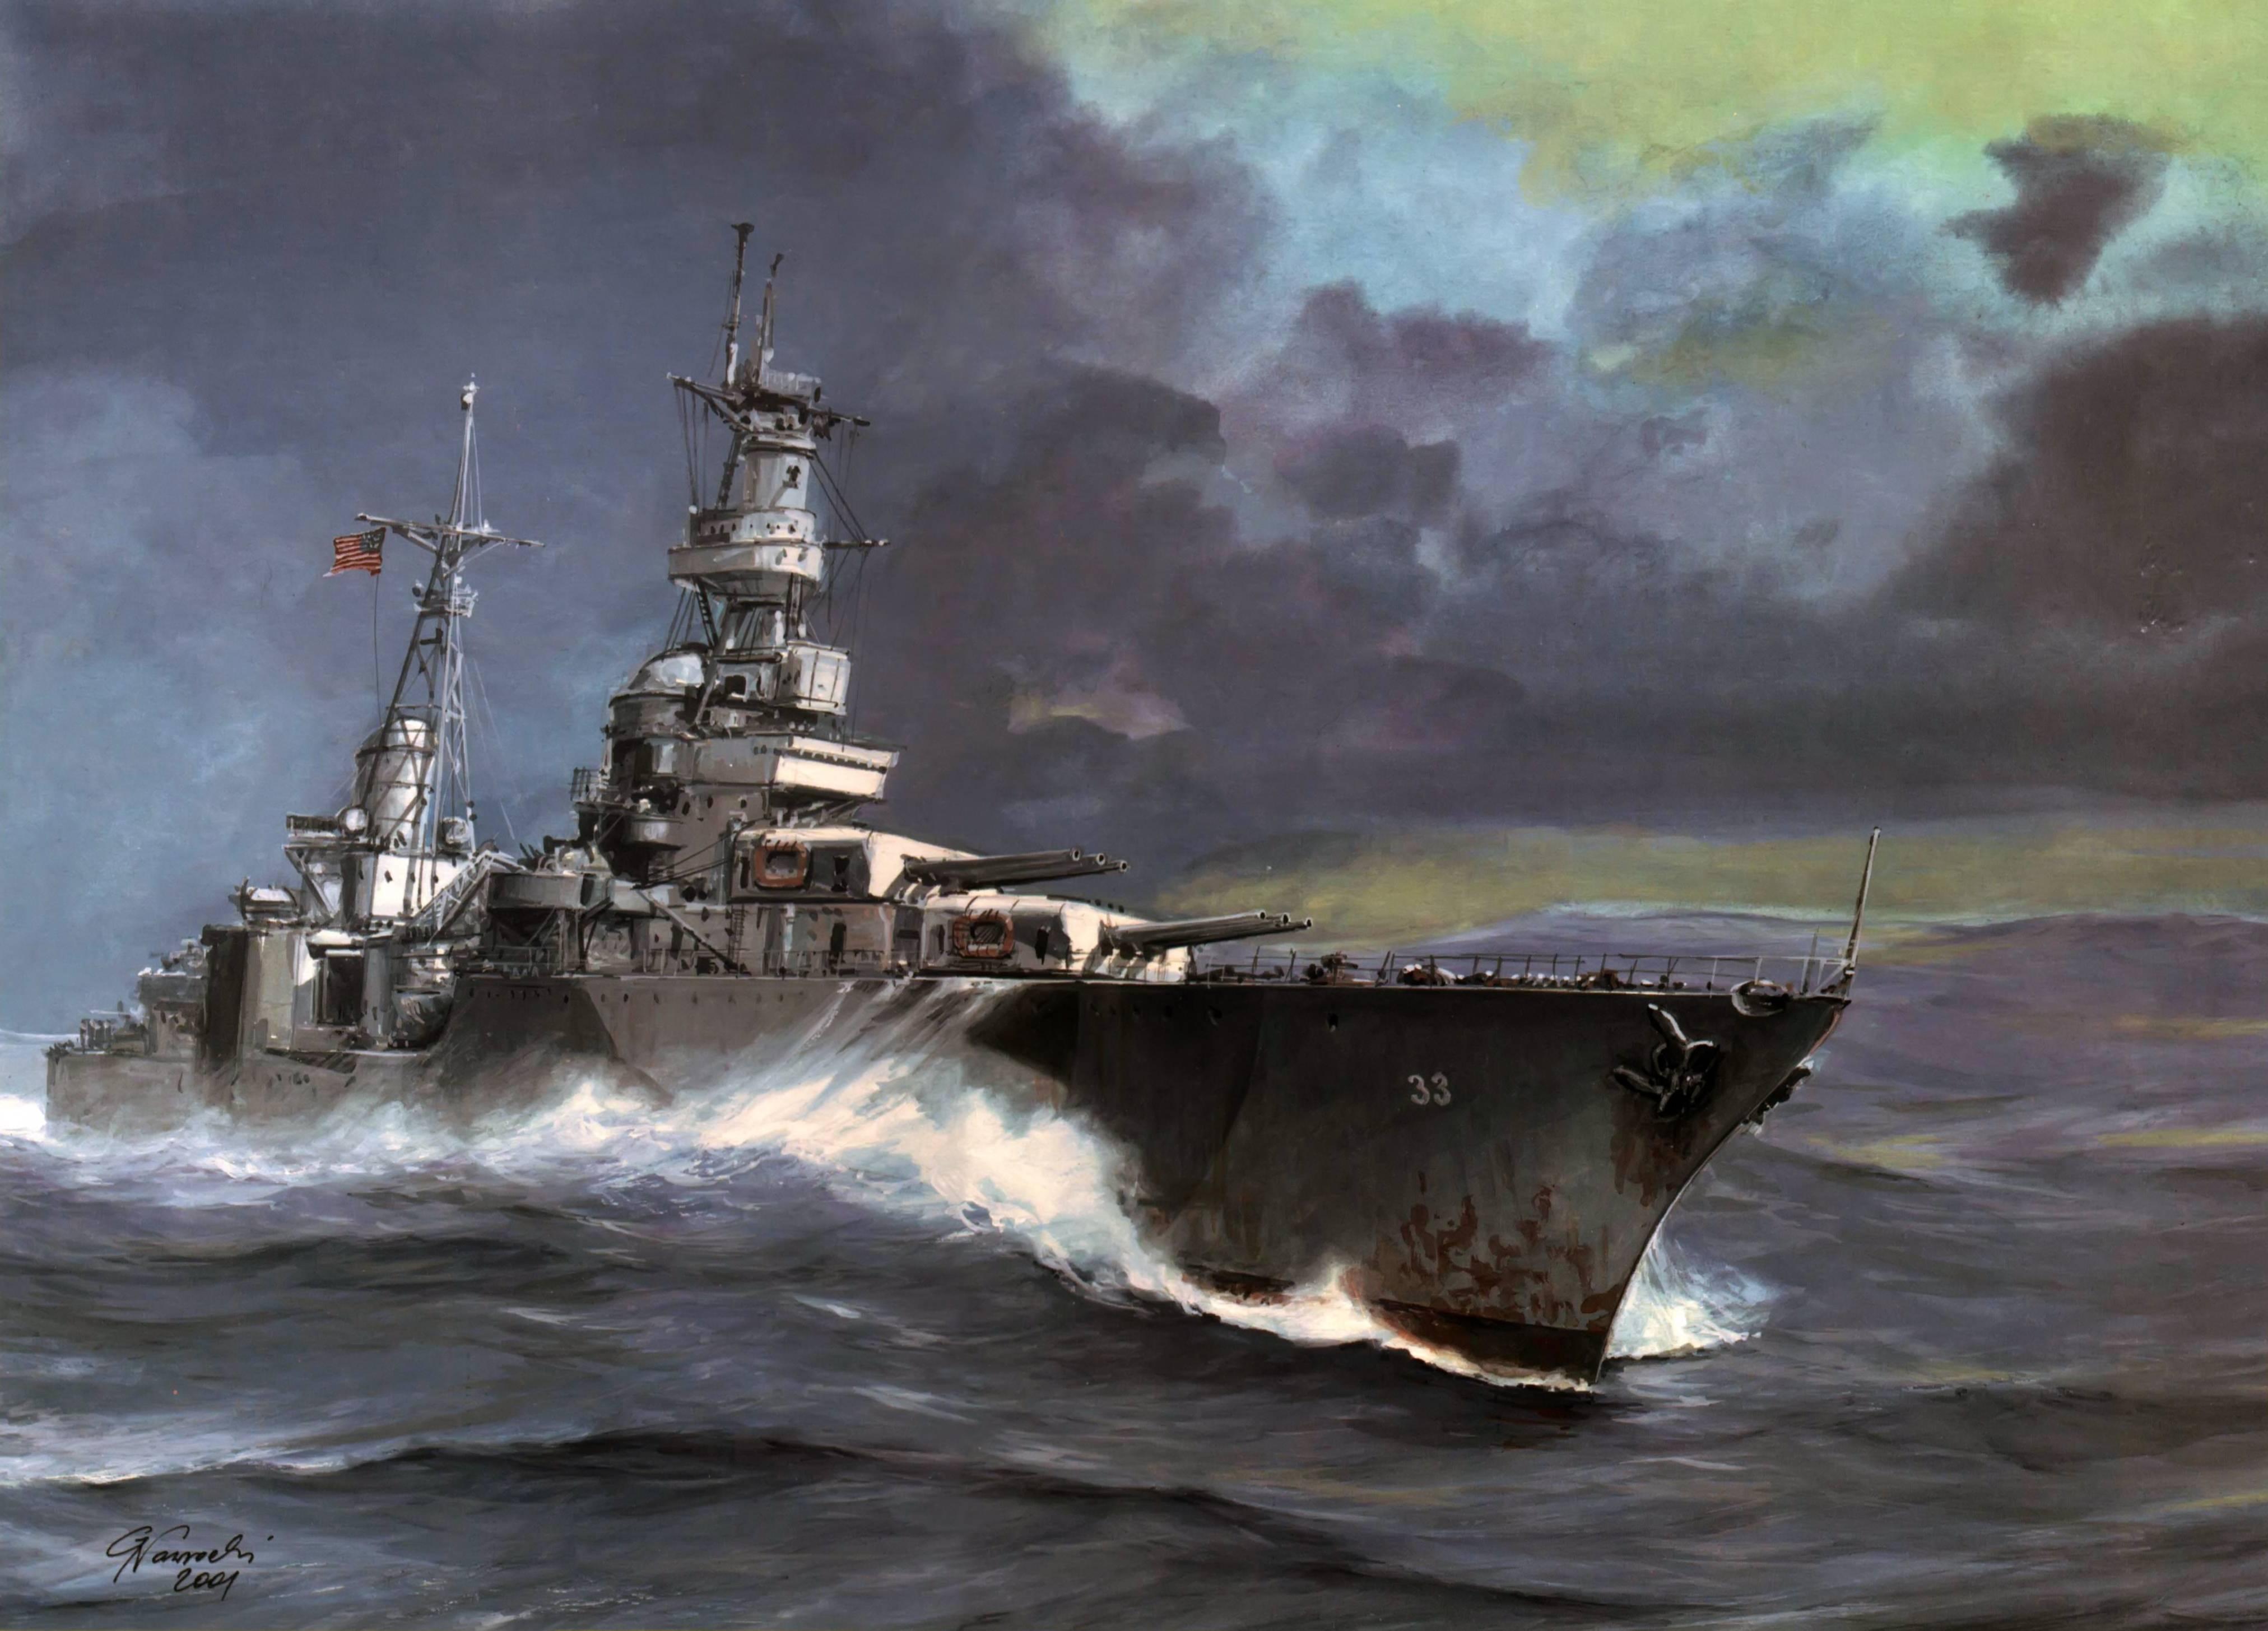 navy wallpaper 1440x900 ships - photo #2